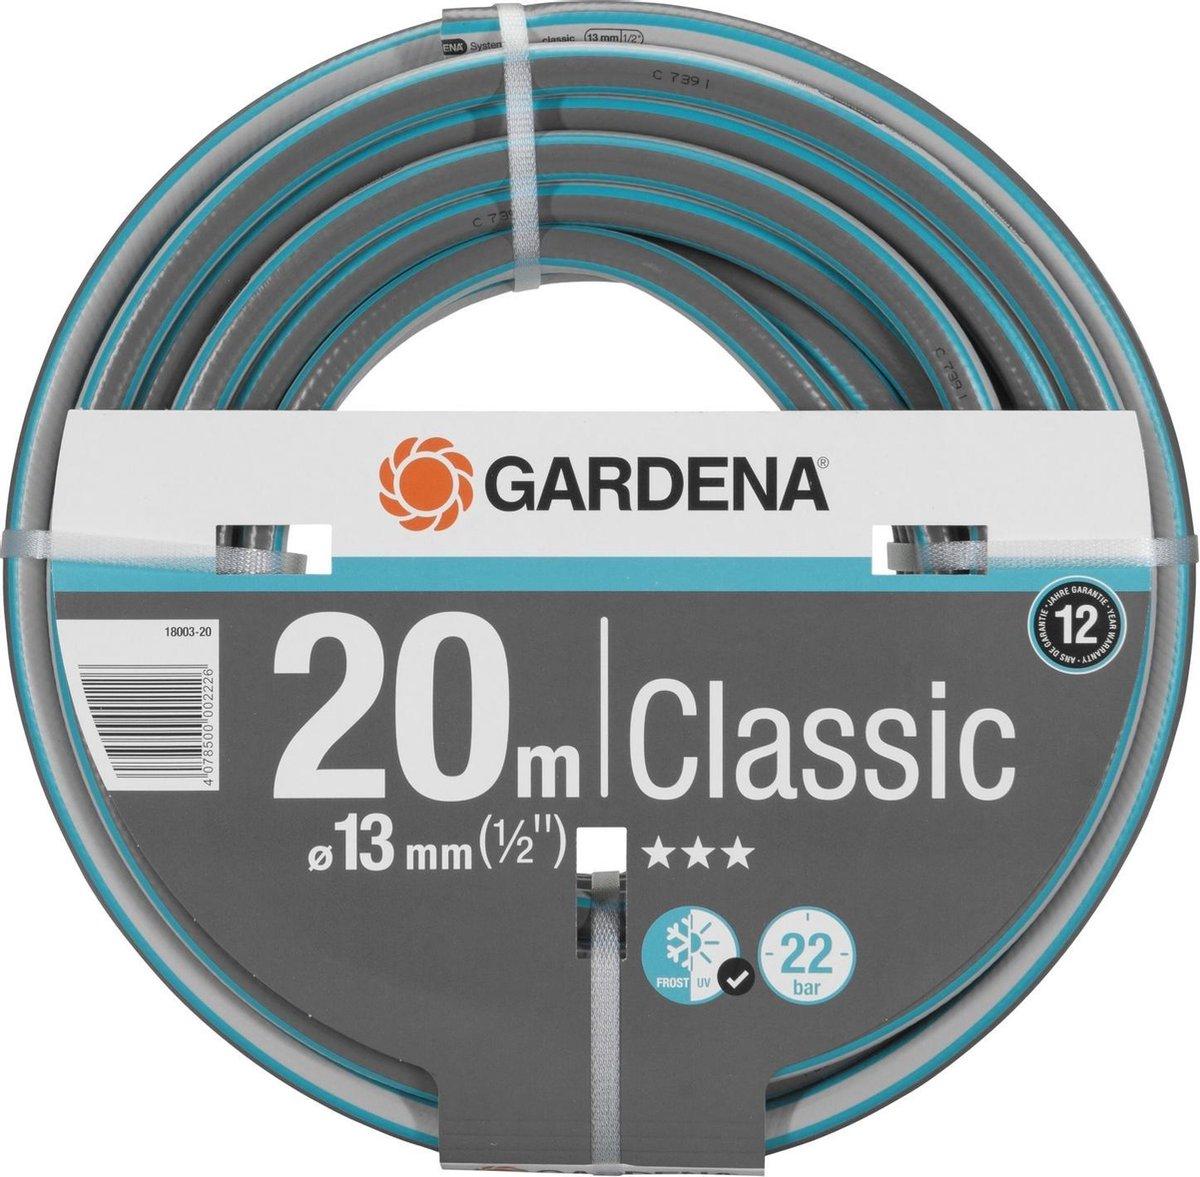 GARDENA Classic Tuinslang - 20 Meter - 13 mm